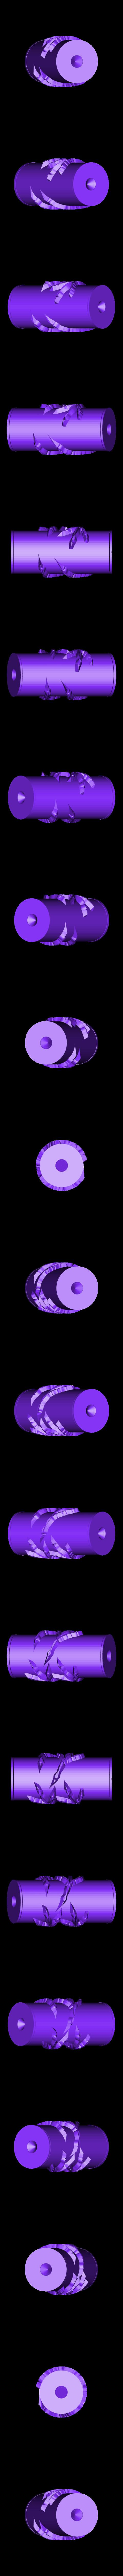 Seagull_Roller.STL Download free STL file Sand Pattern Rollers • 3D printing design, JonathanK1906